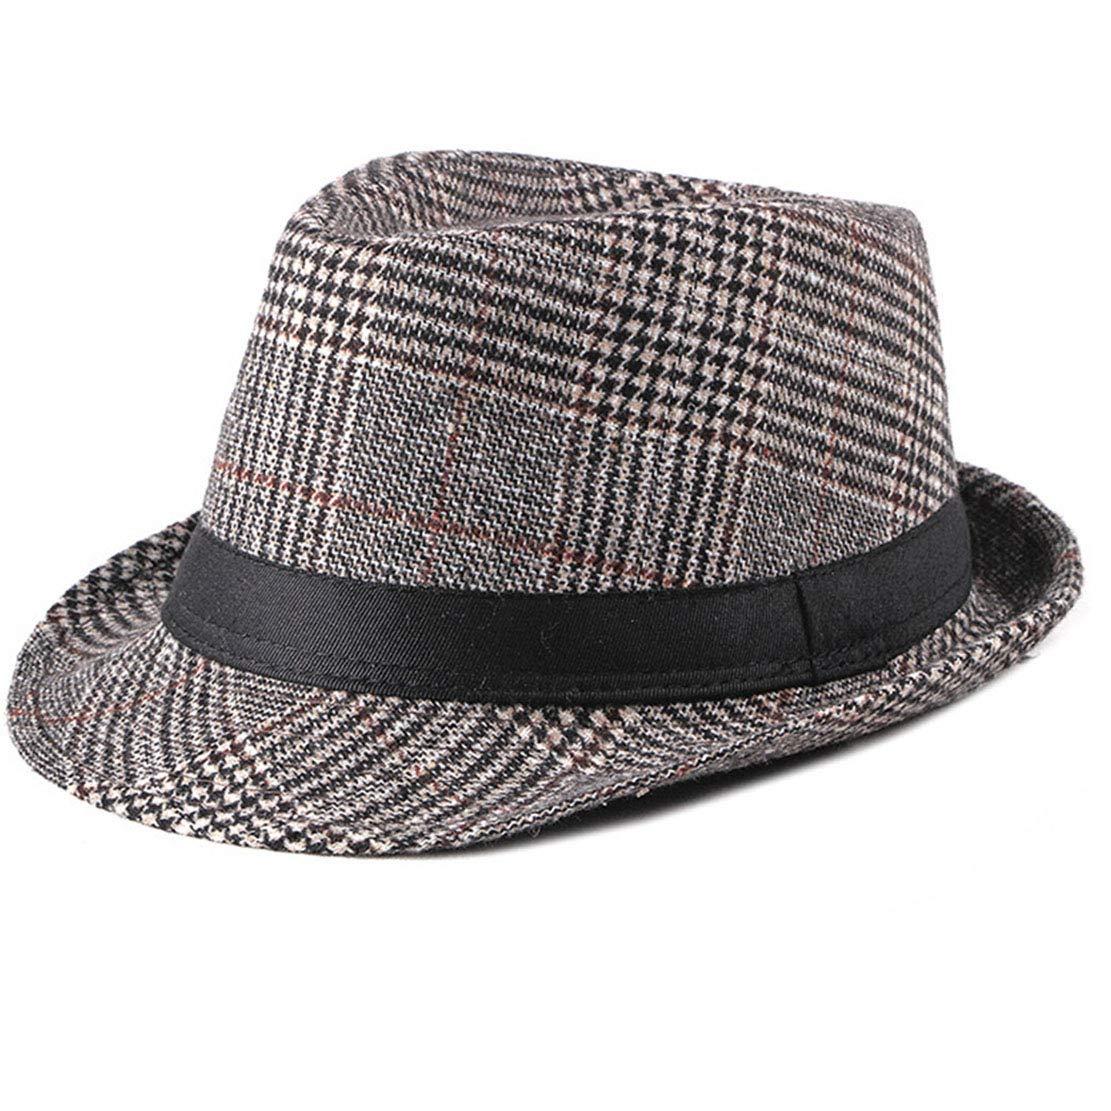 Classic Manhattan Trilby-Dress-Fedora-Hats for Men Woolen Felt Trilby Fedora Hat